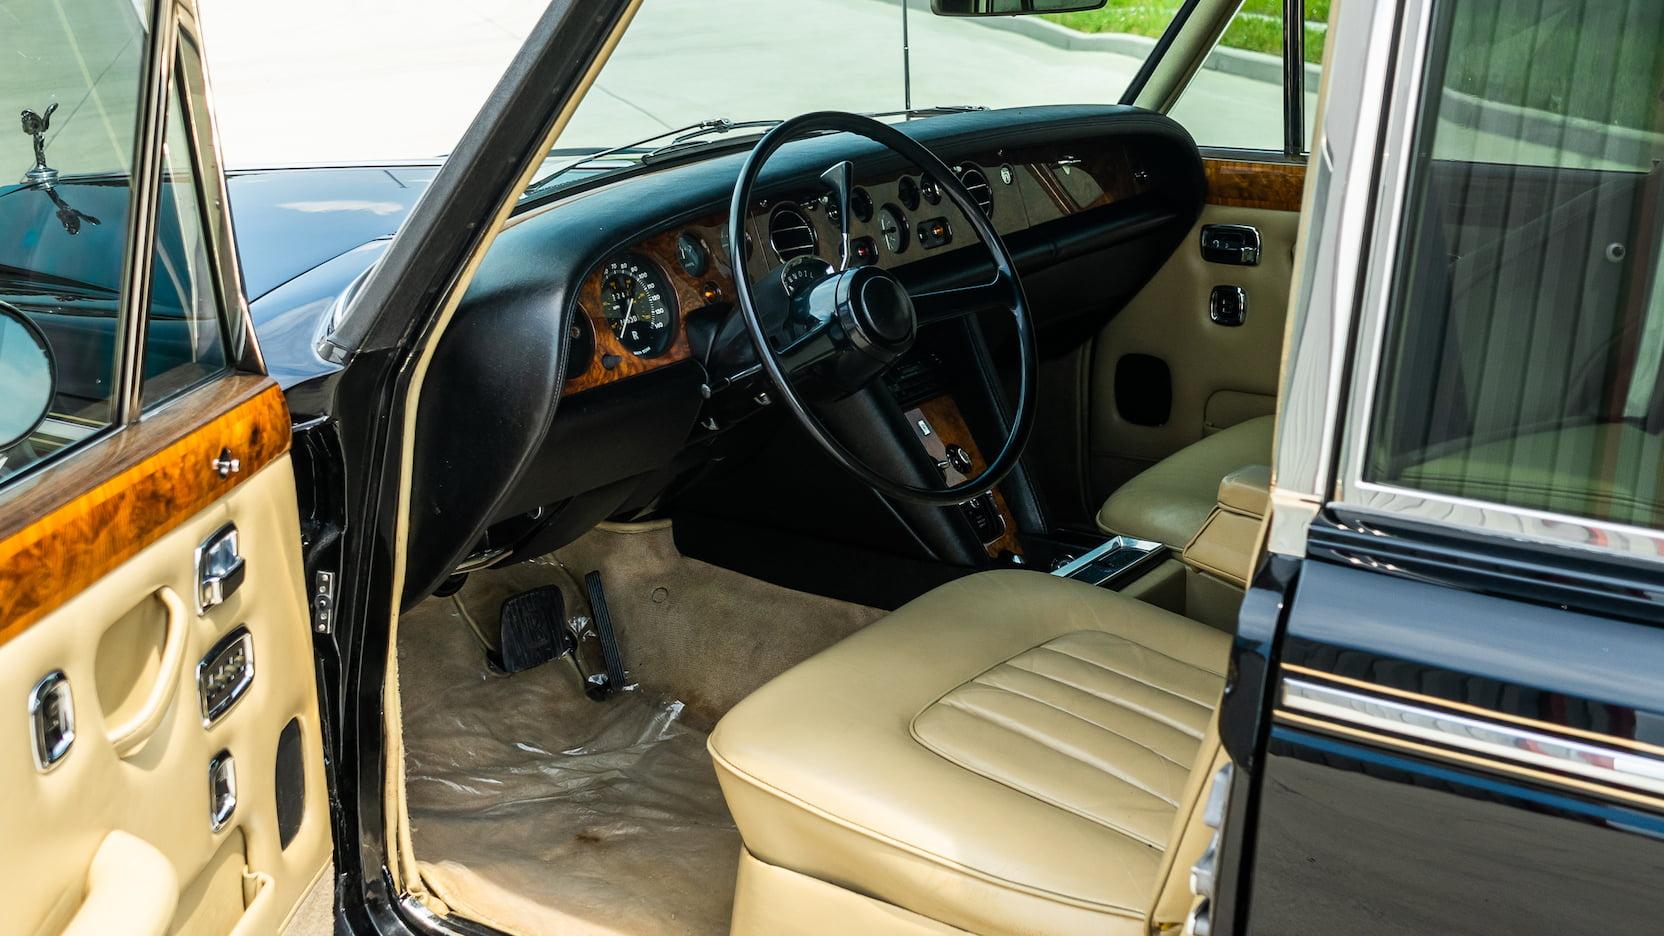 1971 Rolls-Royce Silver Shadow interior